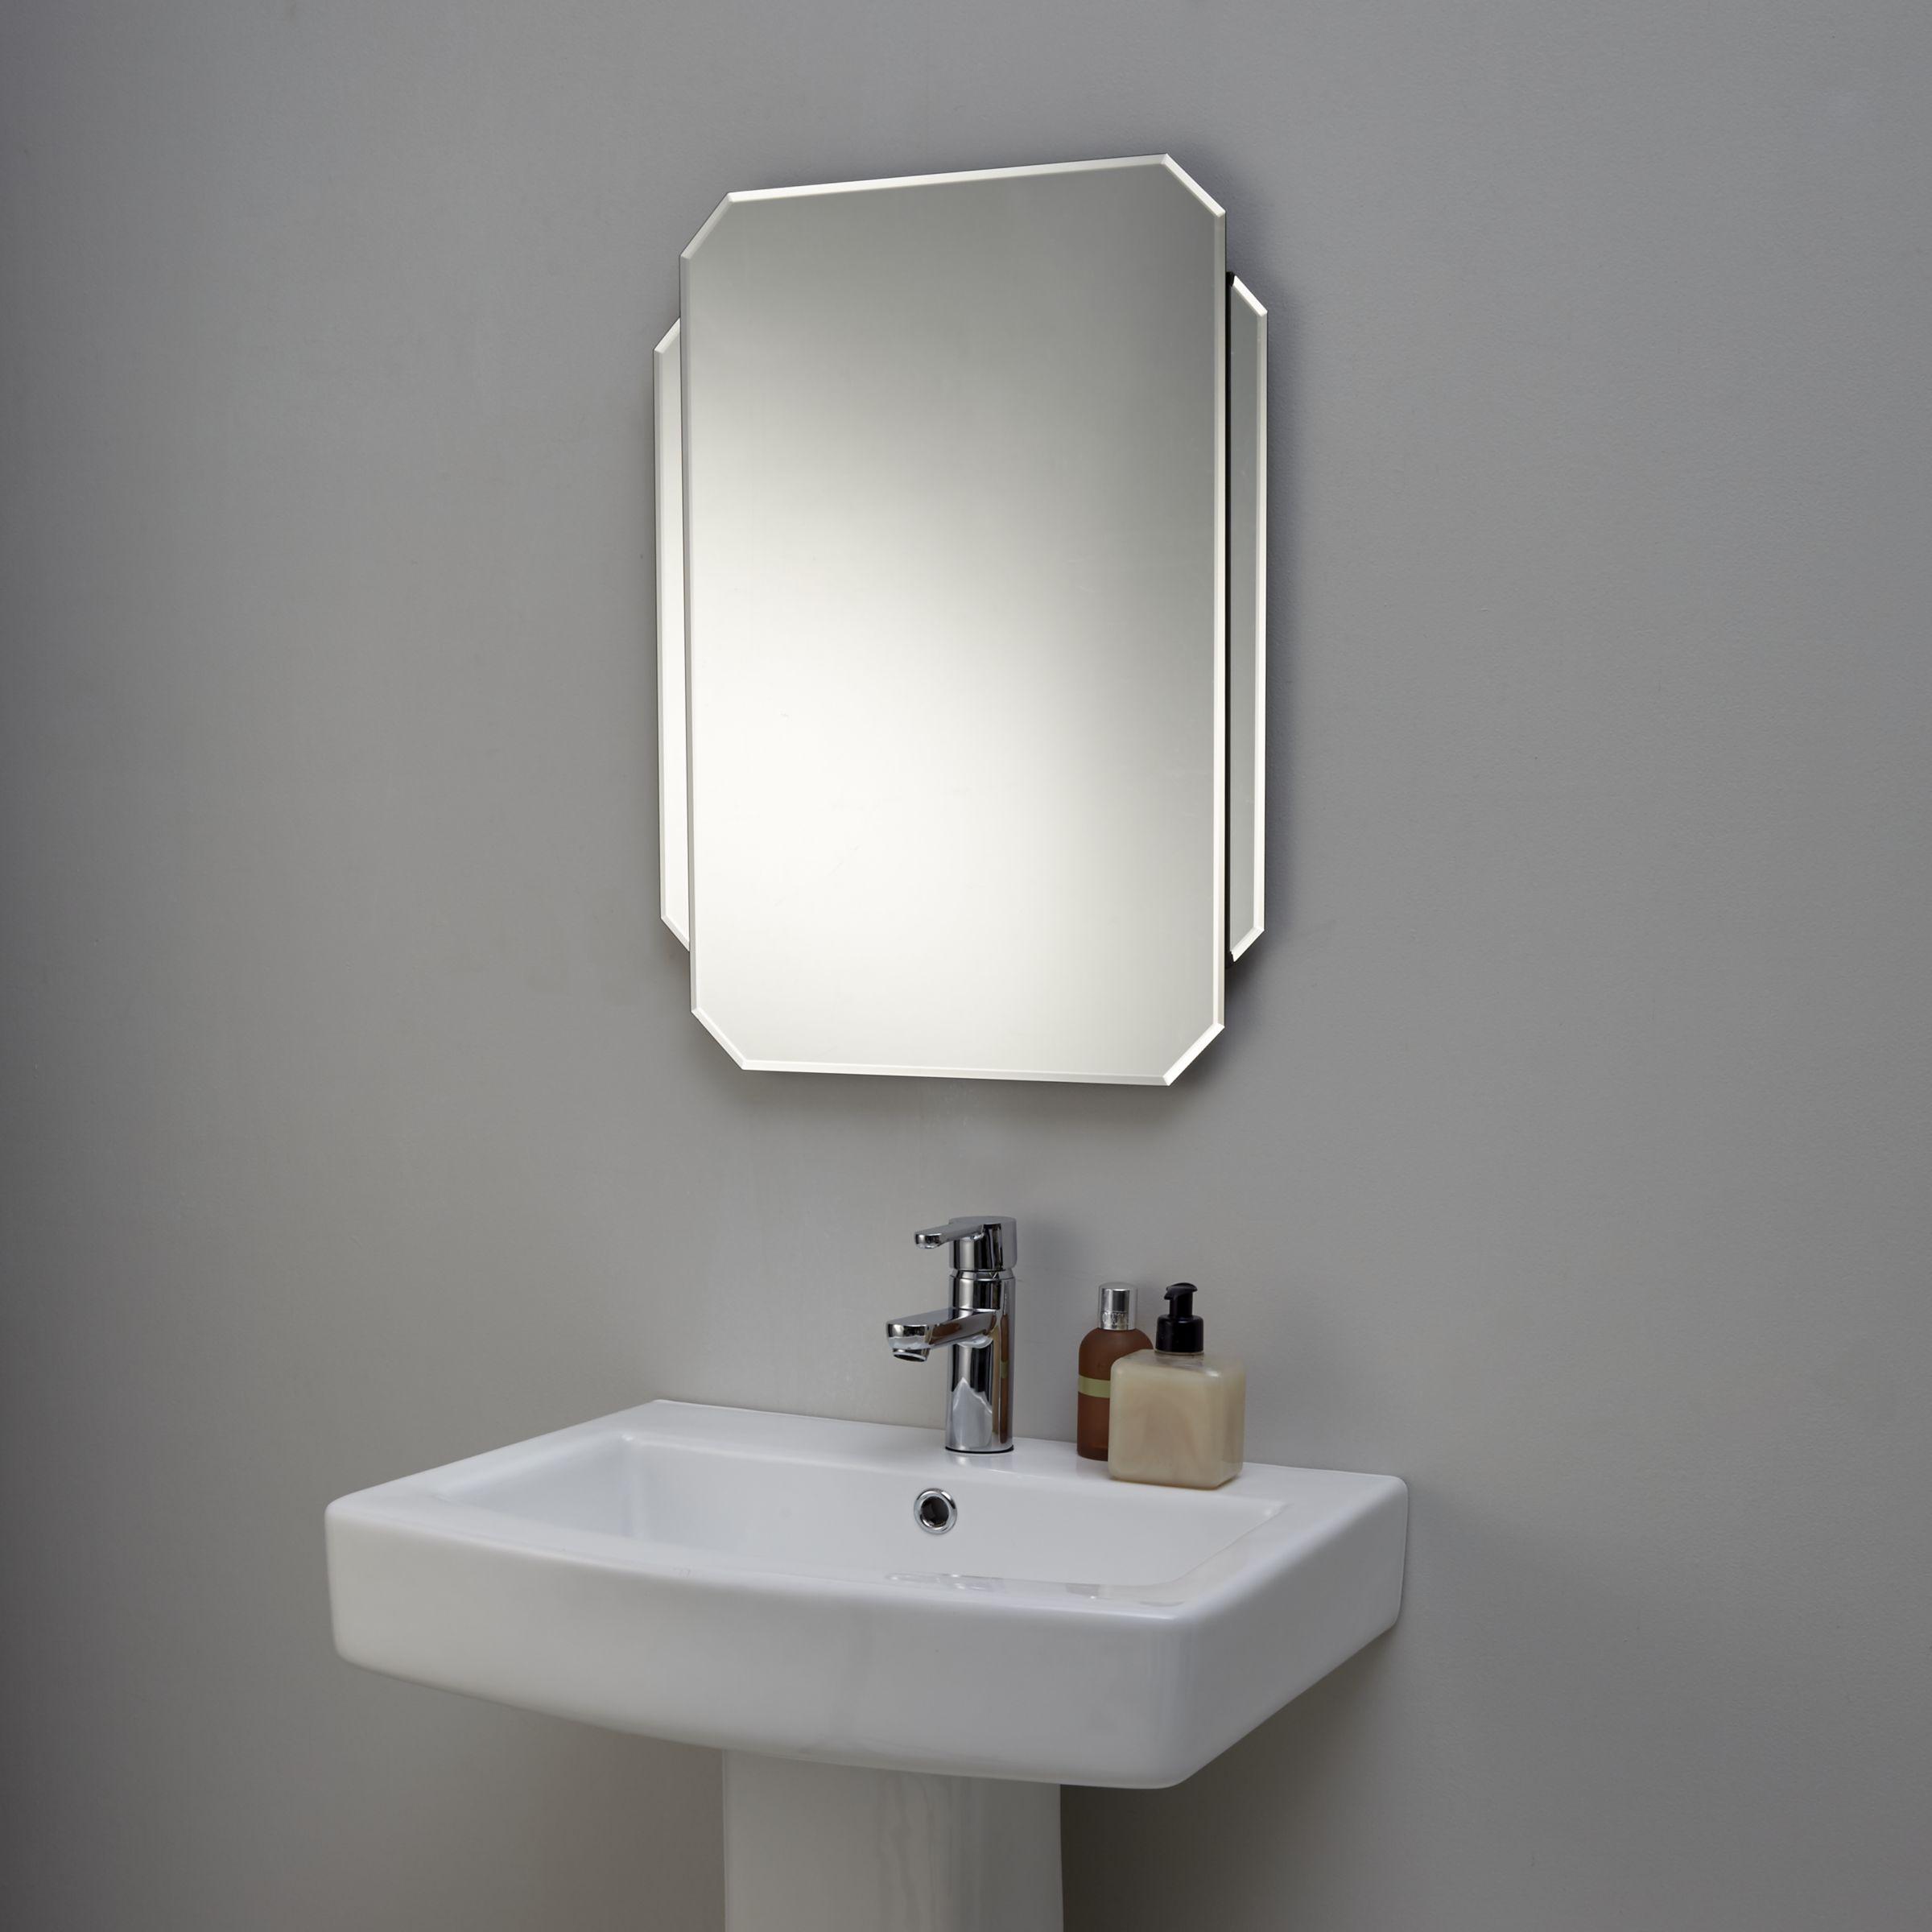 Buy John Lewis Deco Glass Wall Mirror  John Lewis